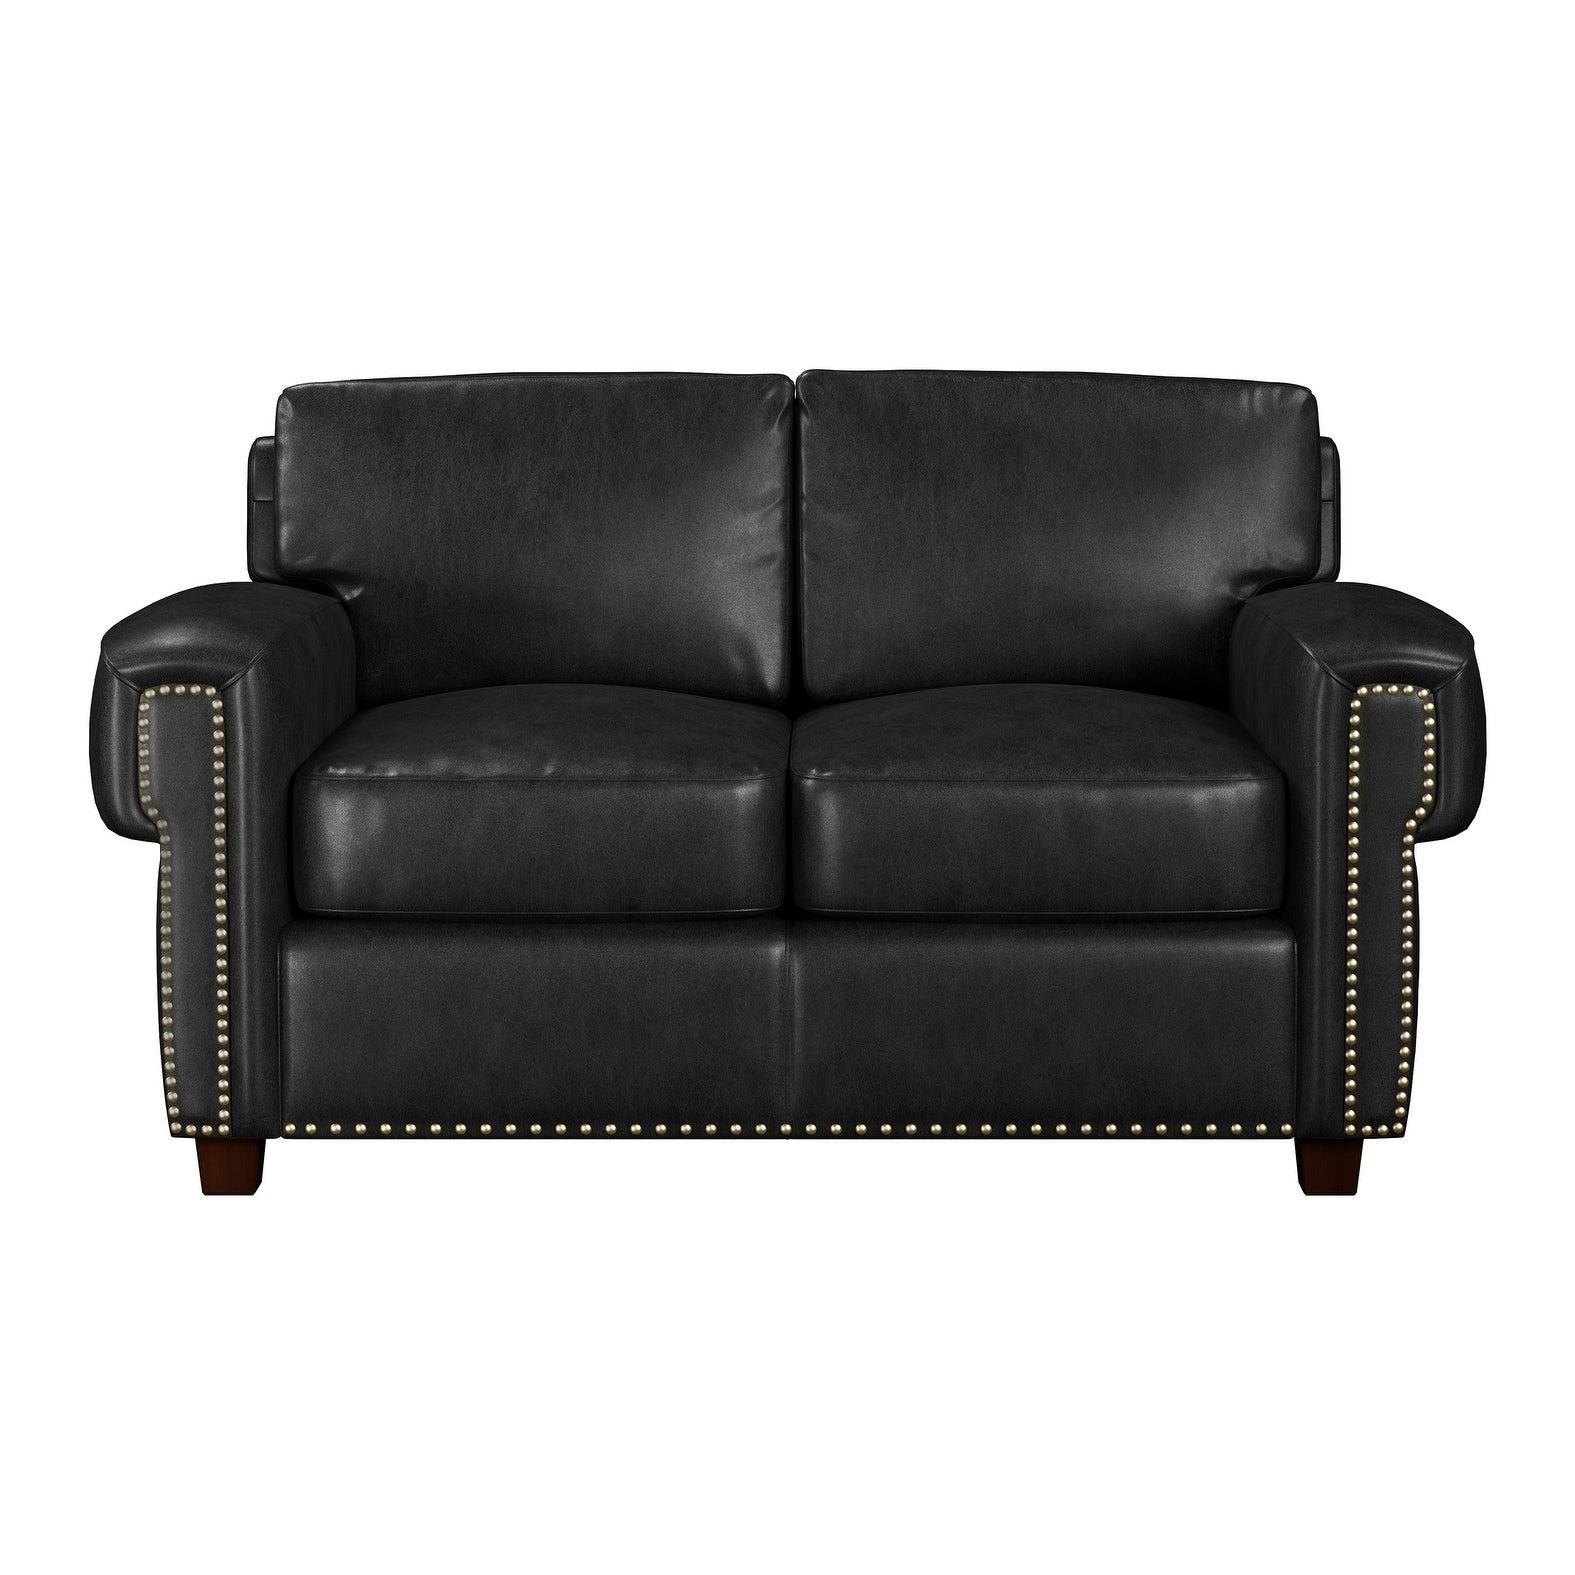 - Shop Made To Order Como 100% Top Grain Leather Twin Sleeper Sofa